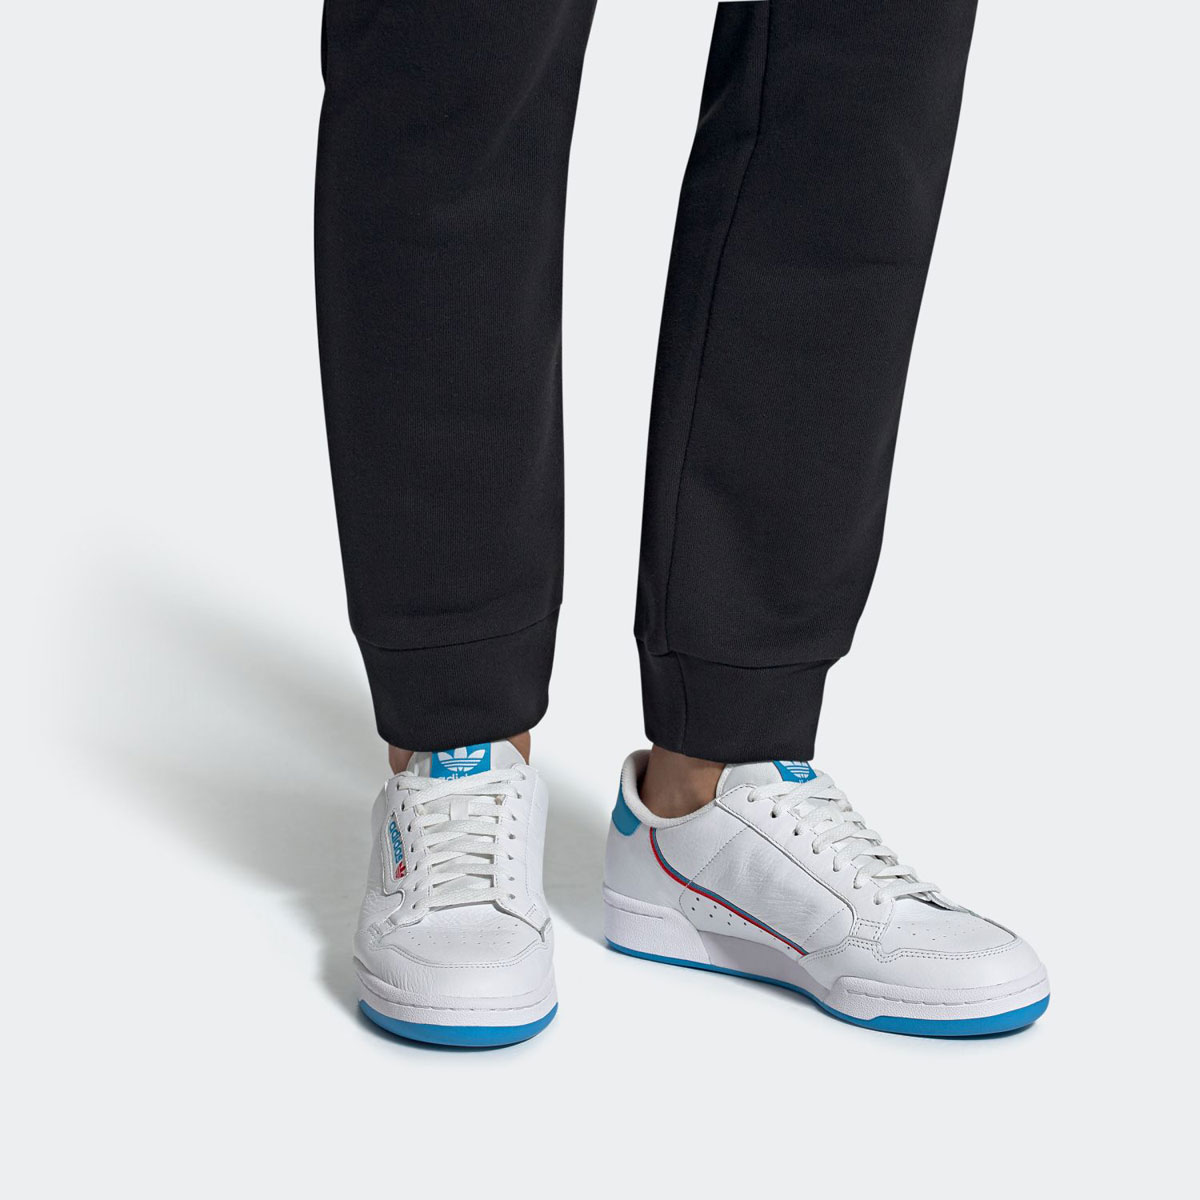 adidas Originals CONTINENTAL 80 (アディダスオリジナルス コンチネンタル 80)FTWR WHITE/SHOCK CYAN/FTWR WHITE【メンズ レディース スニーカー】19SS-I